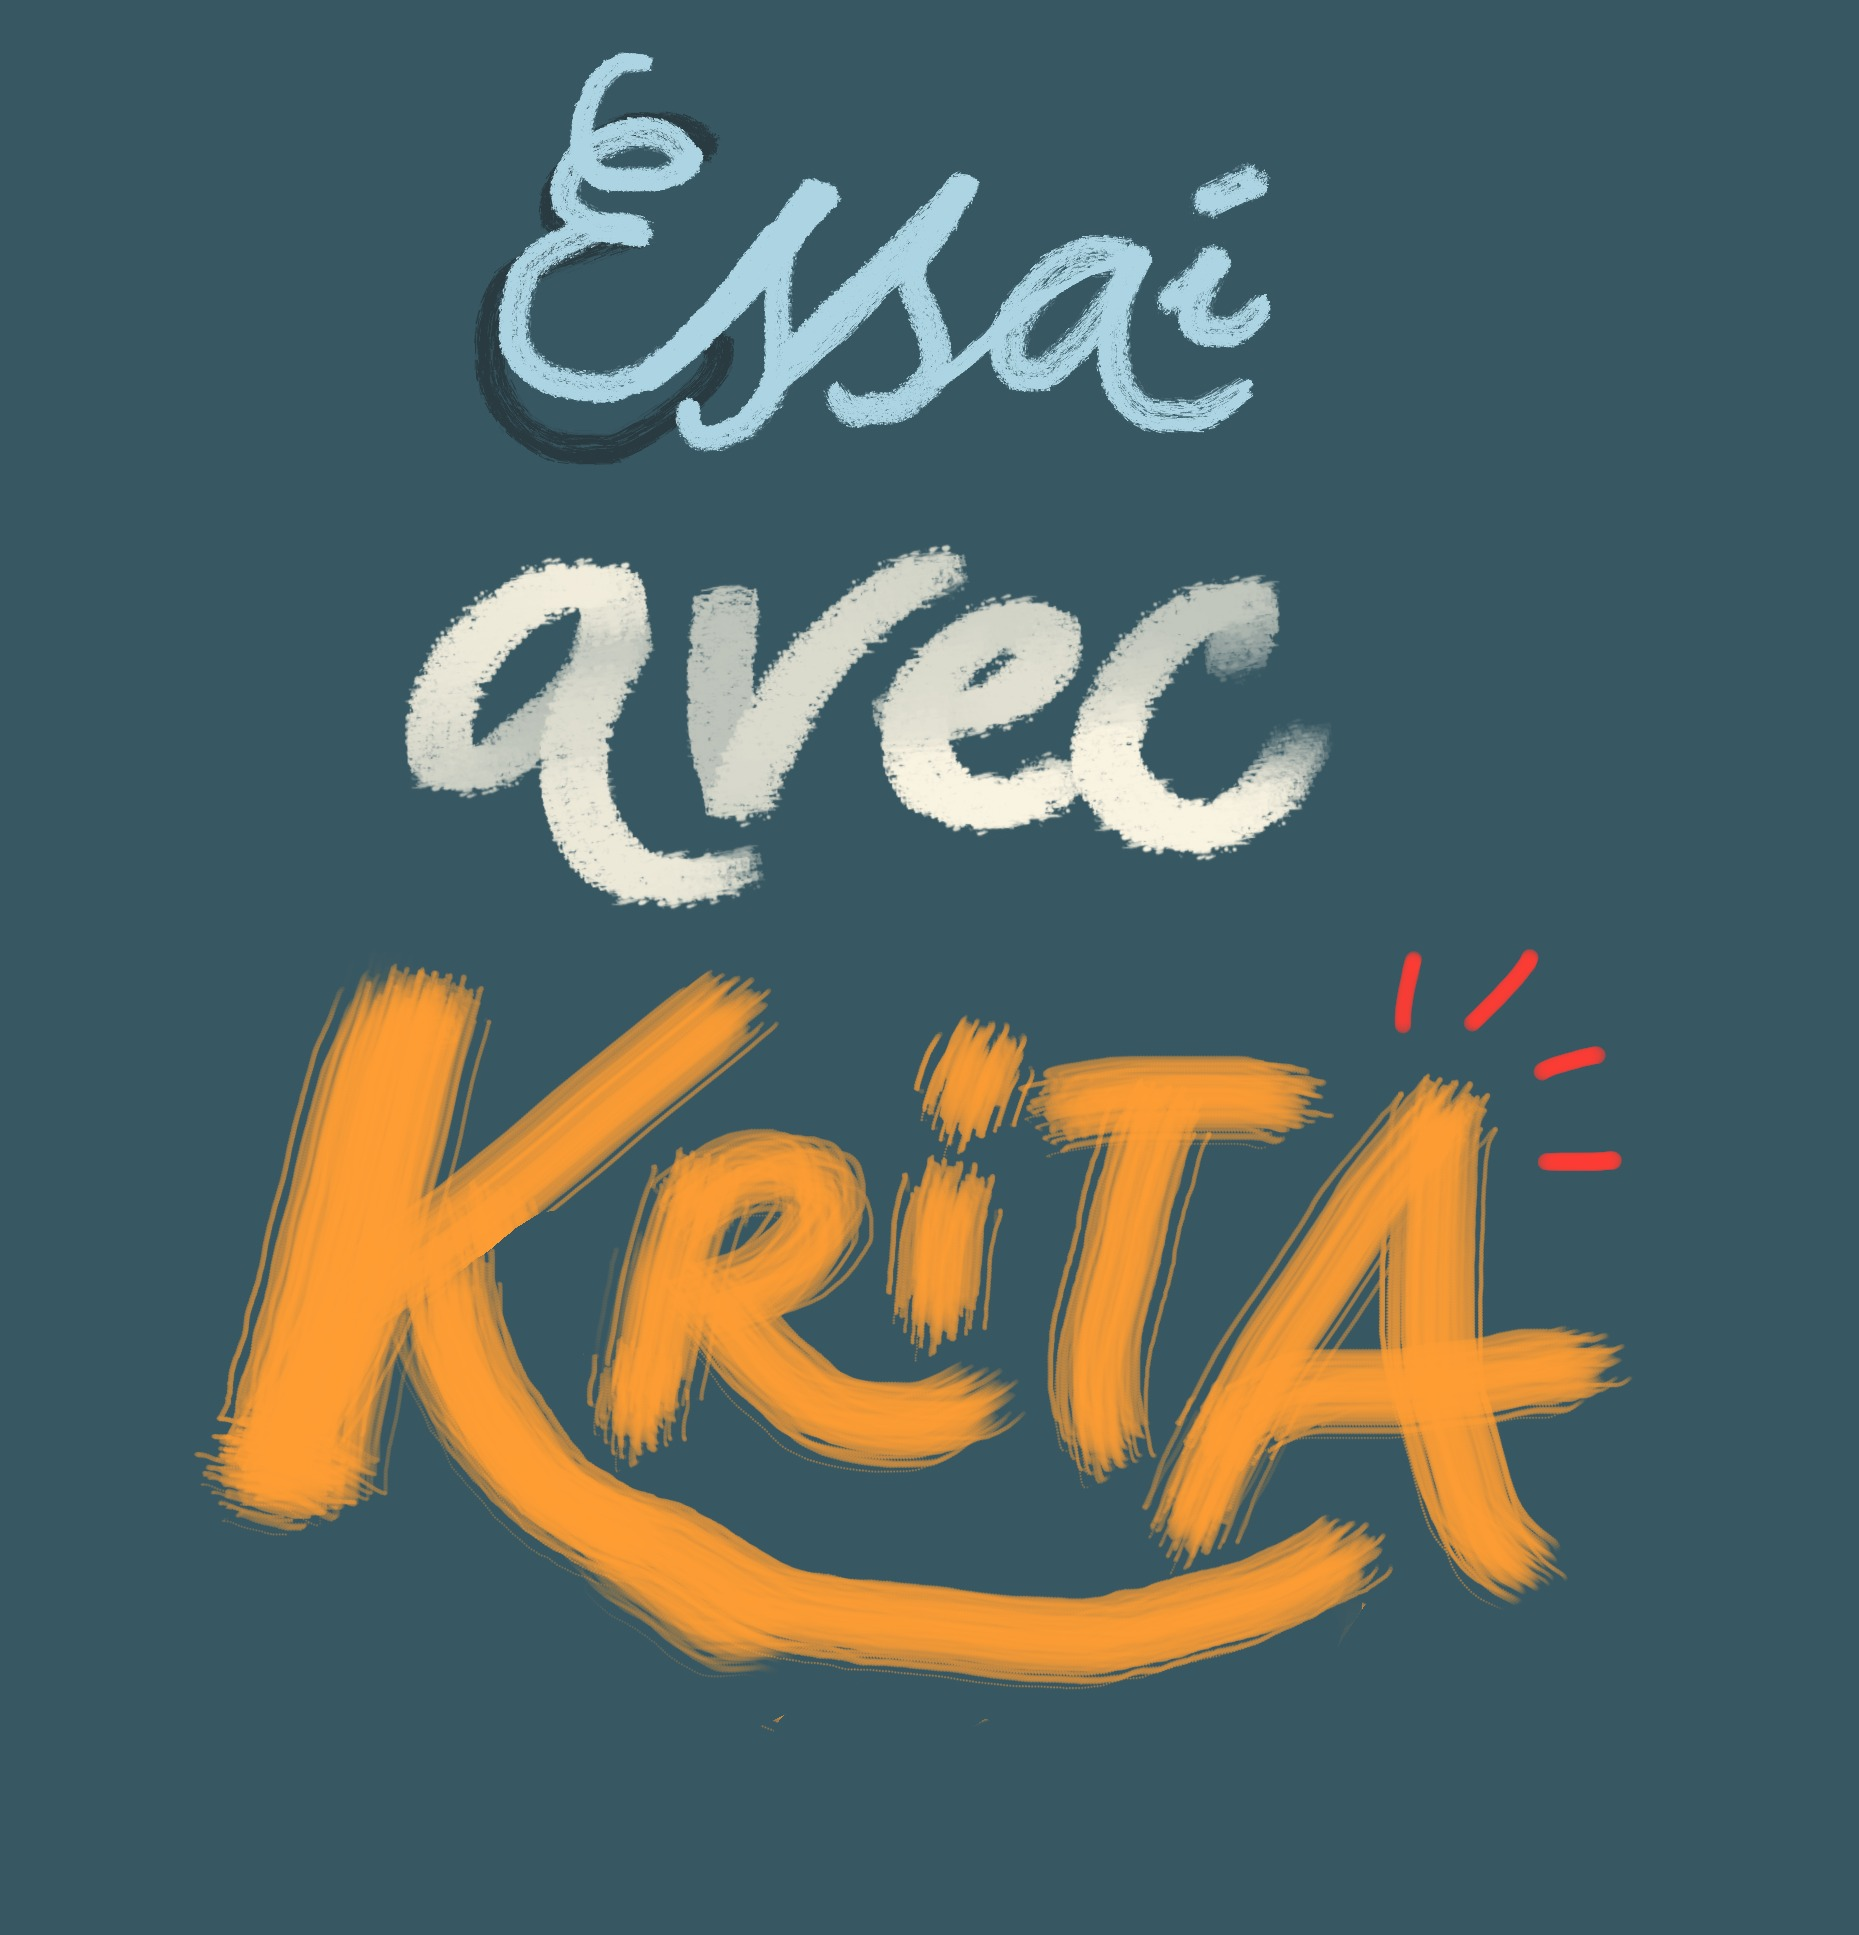 Un essai avec Krita